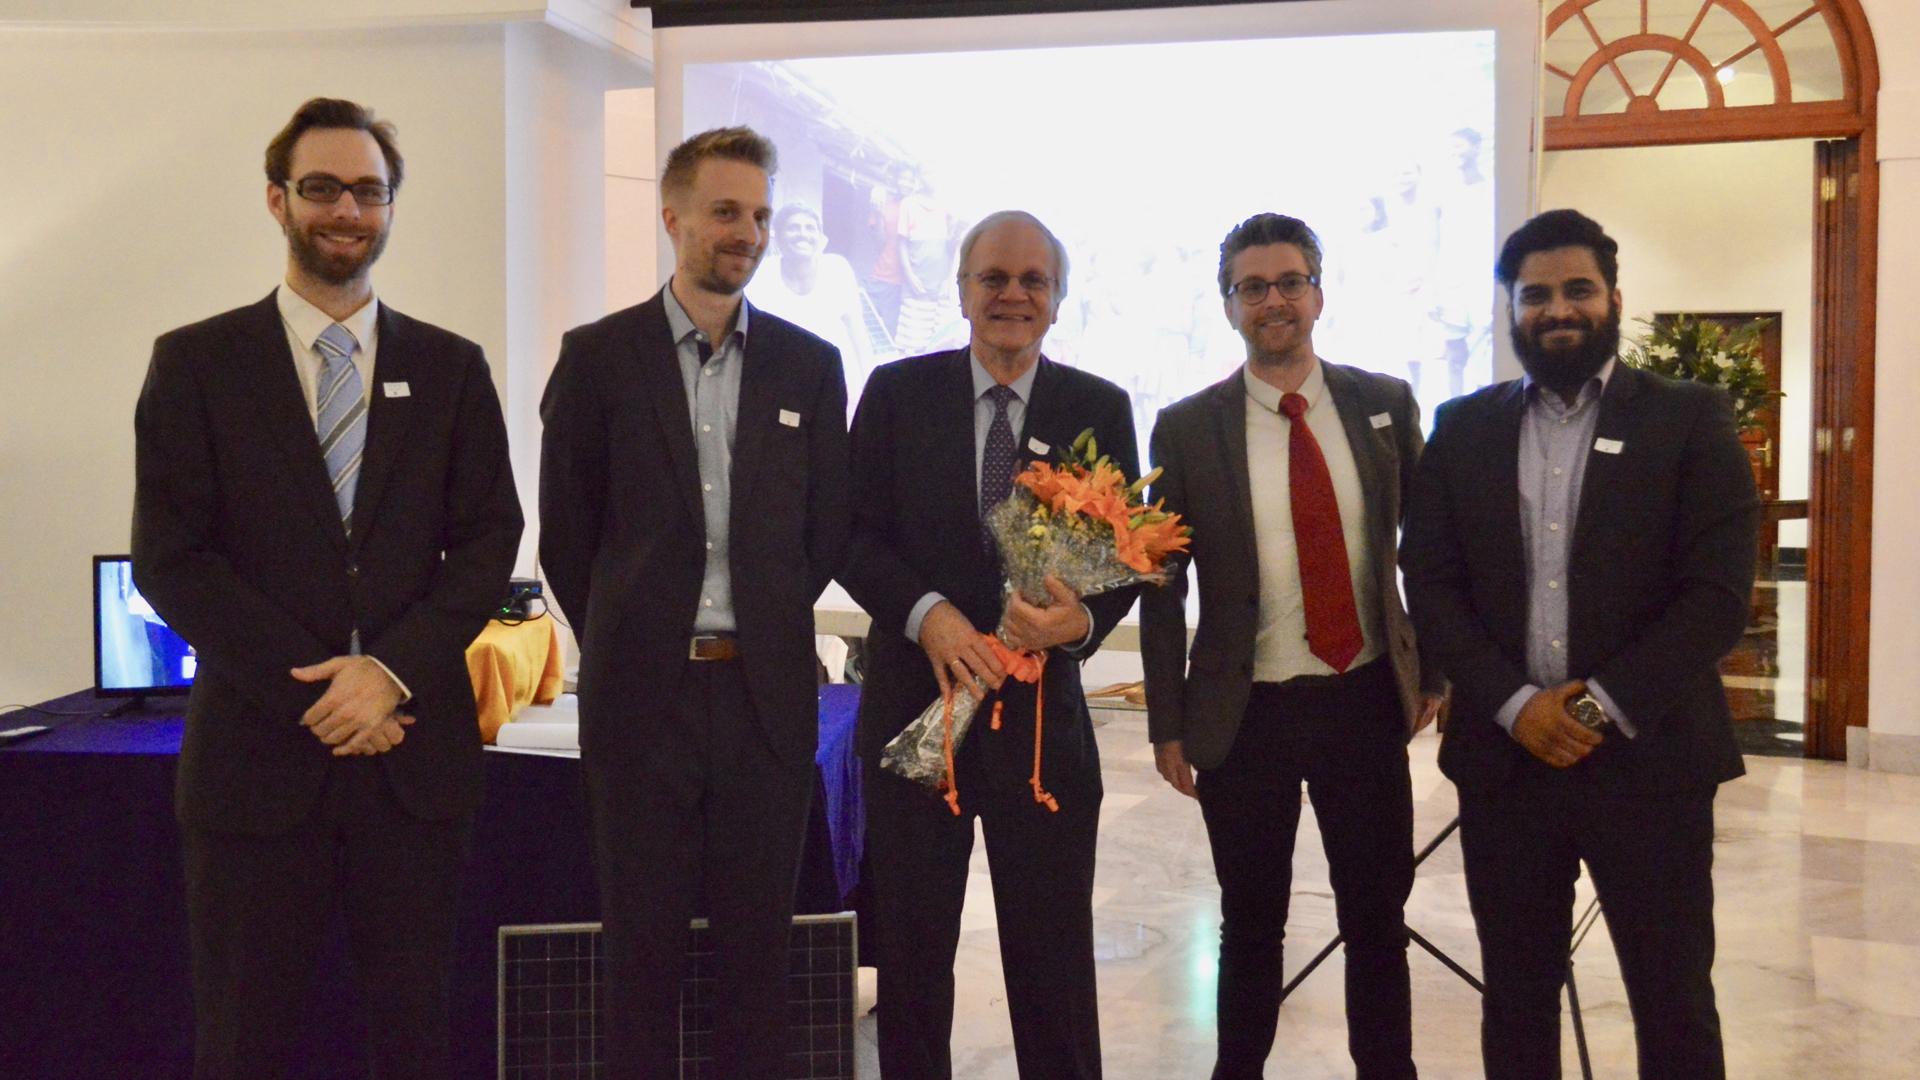 Rob, Evan, Mr. Ambassador Alphonso Stoelinga, Harmen and Prarabdh after launching the kit and sharing the vision of Rural Spark.